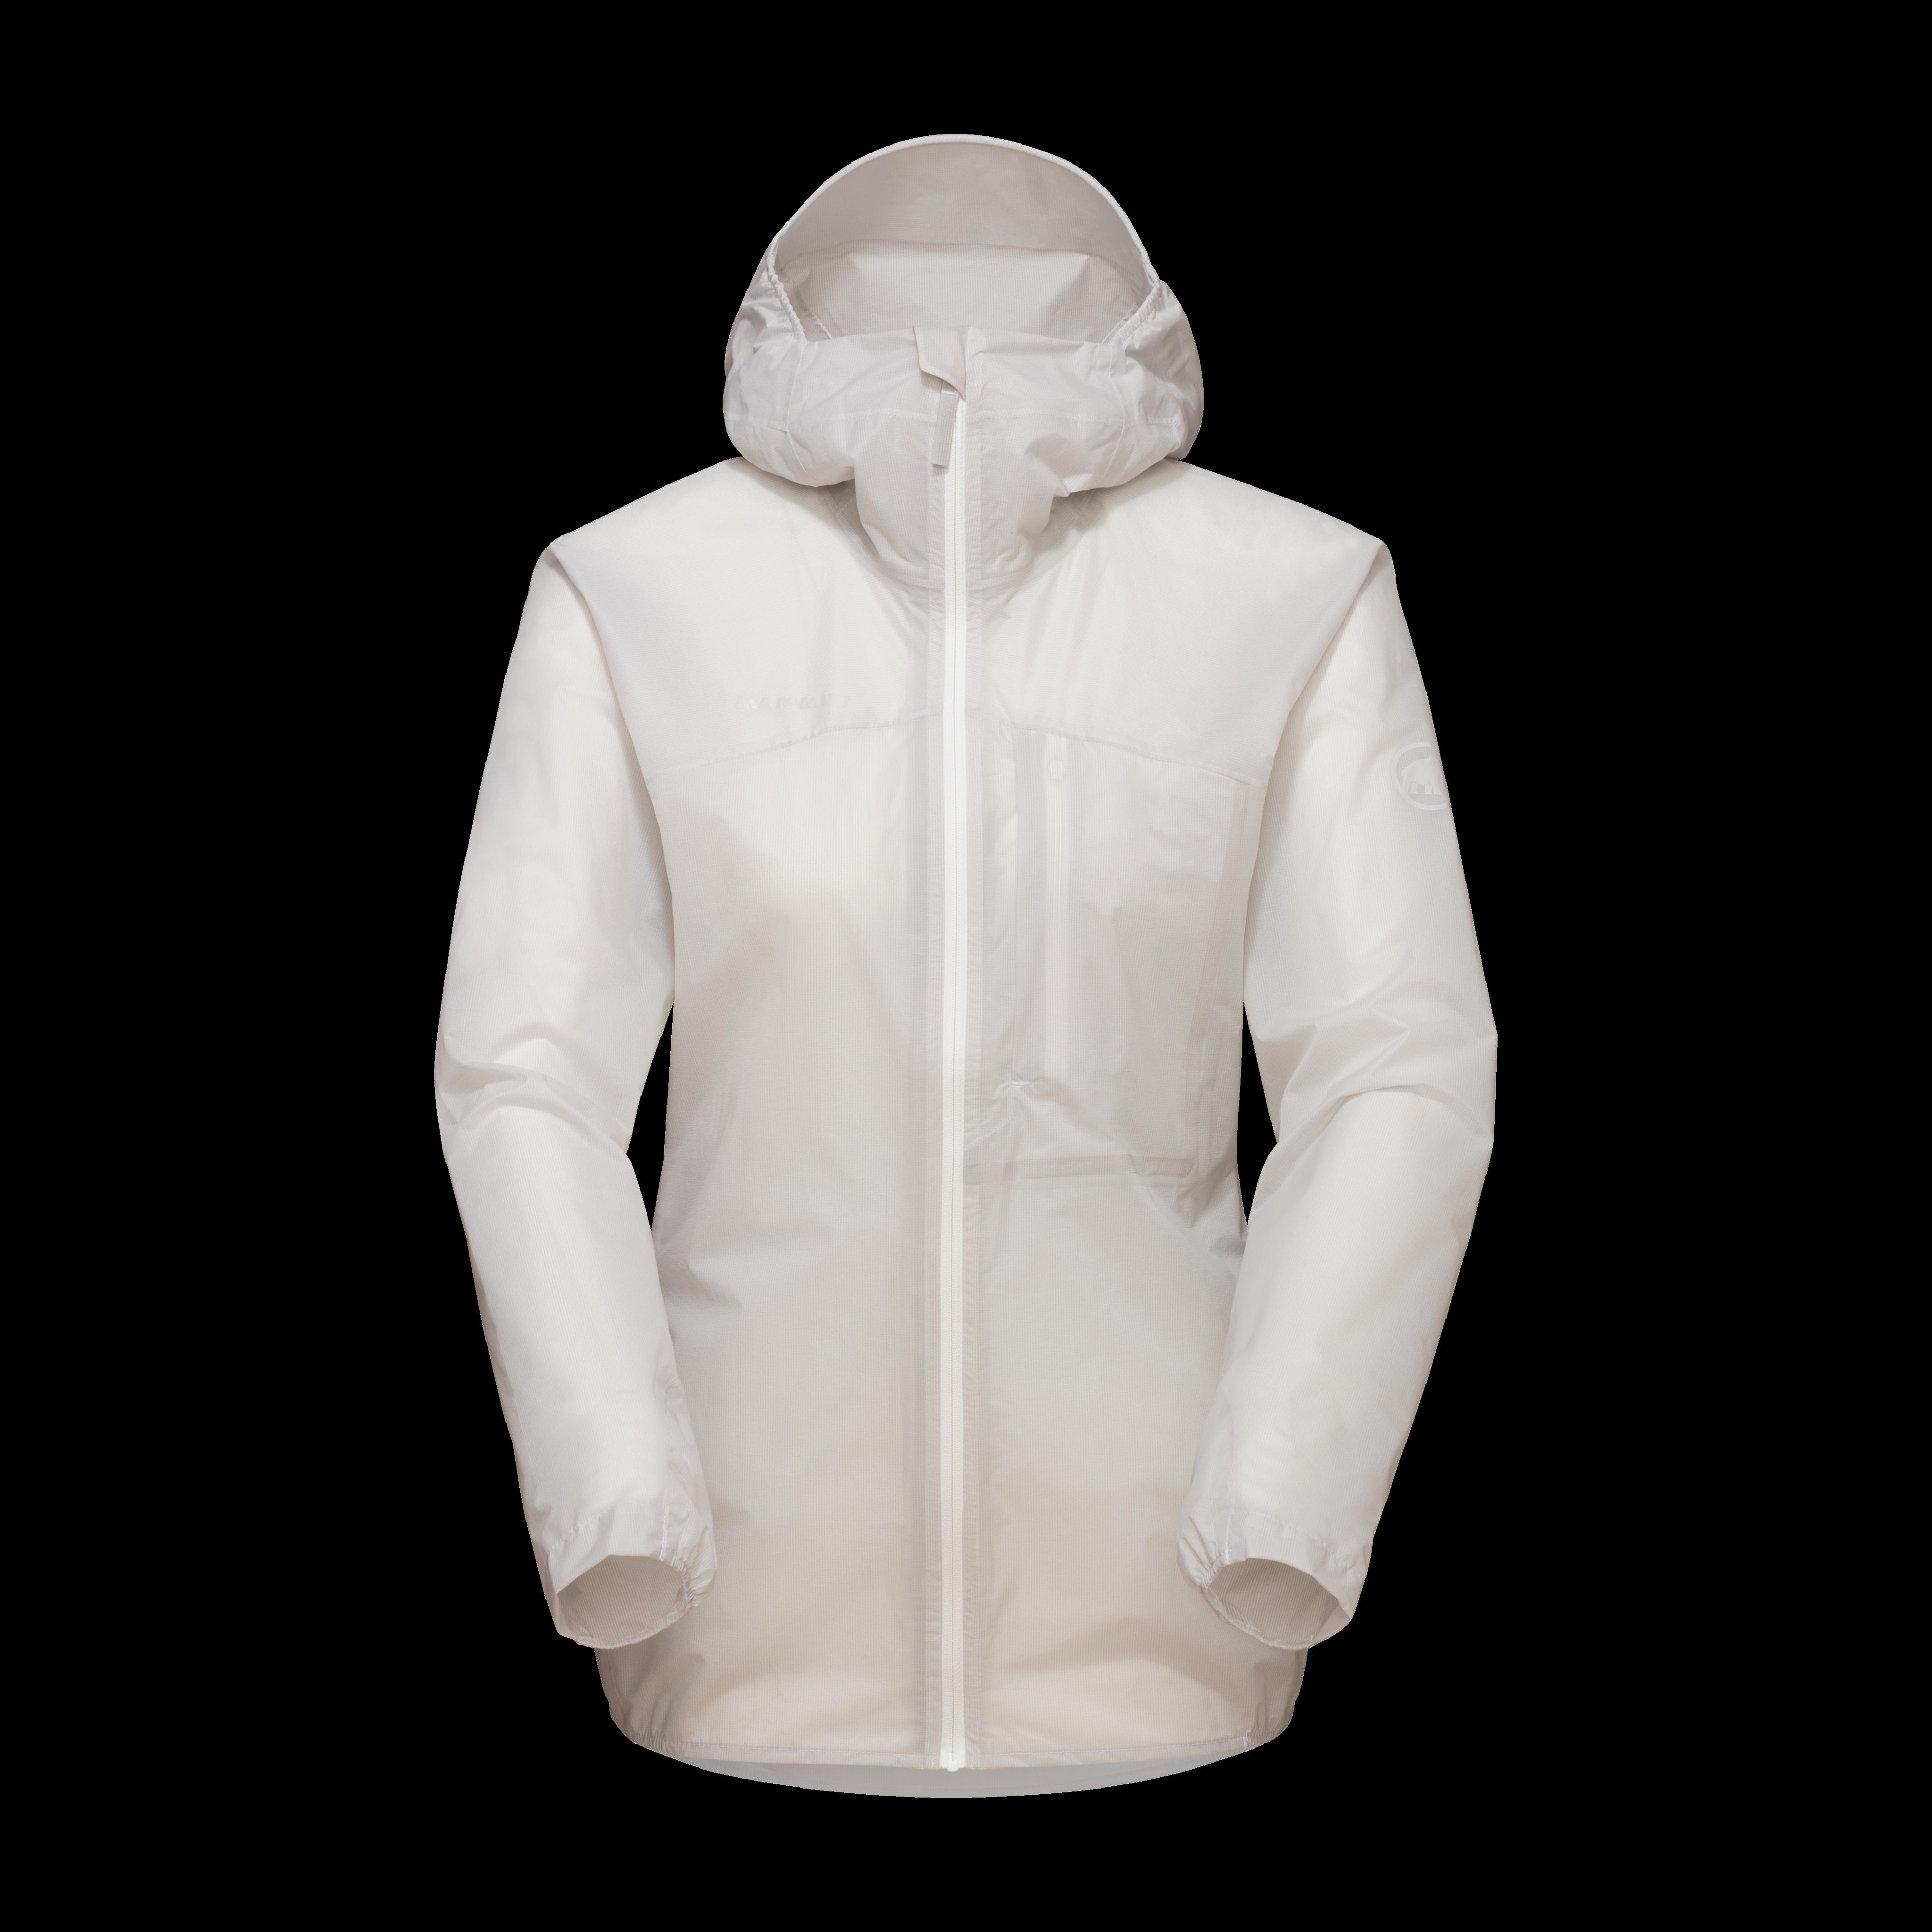 Kento Light HS Hooded Jacket Women - bright white, M thumbnail